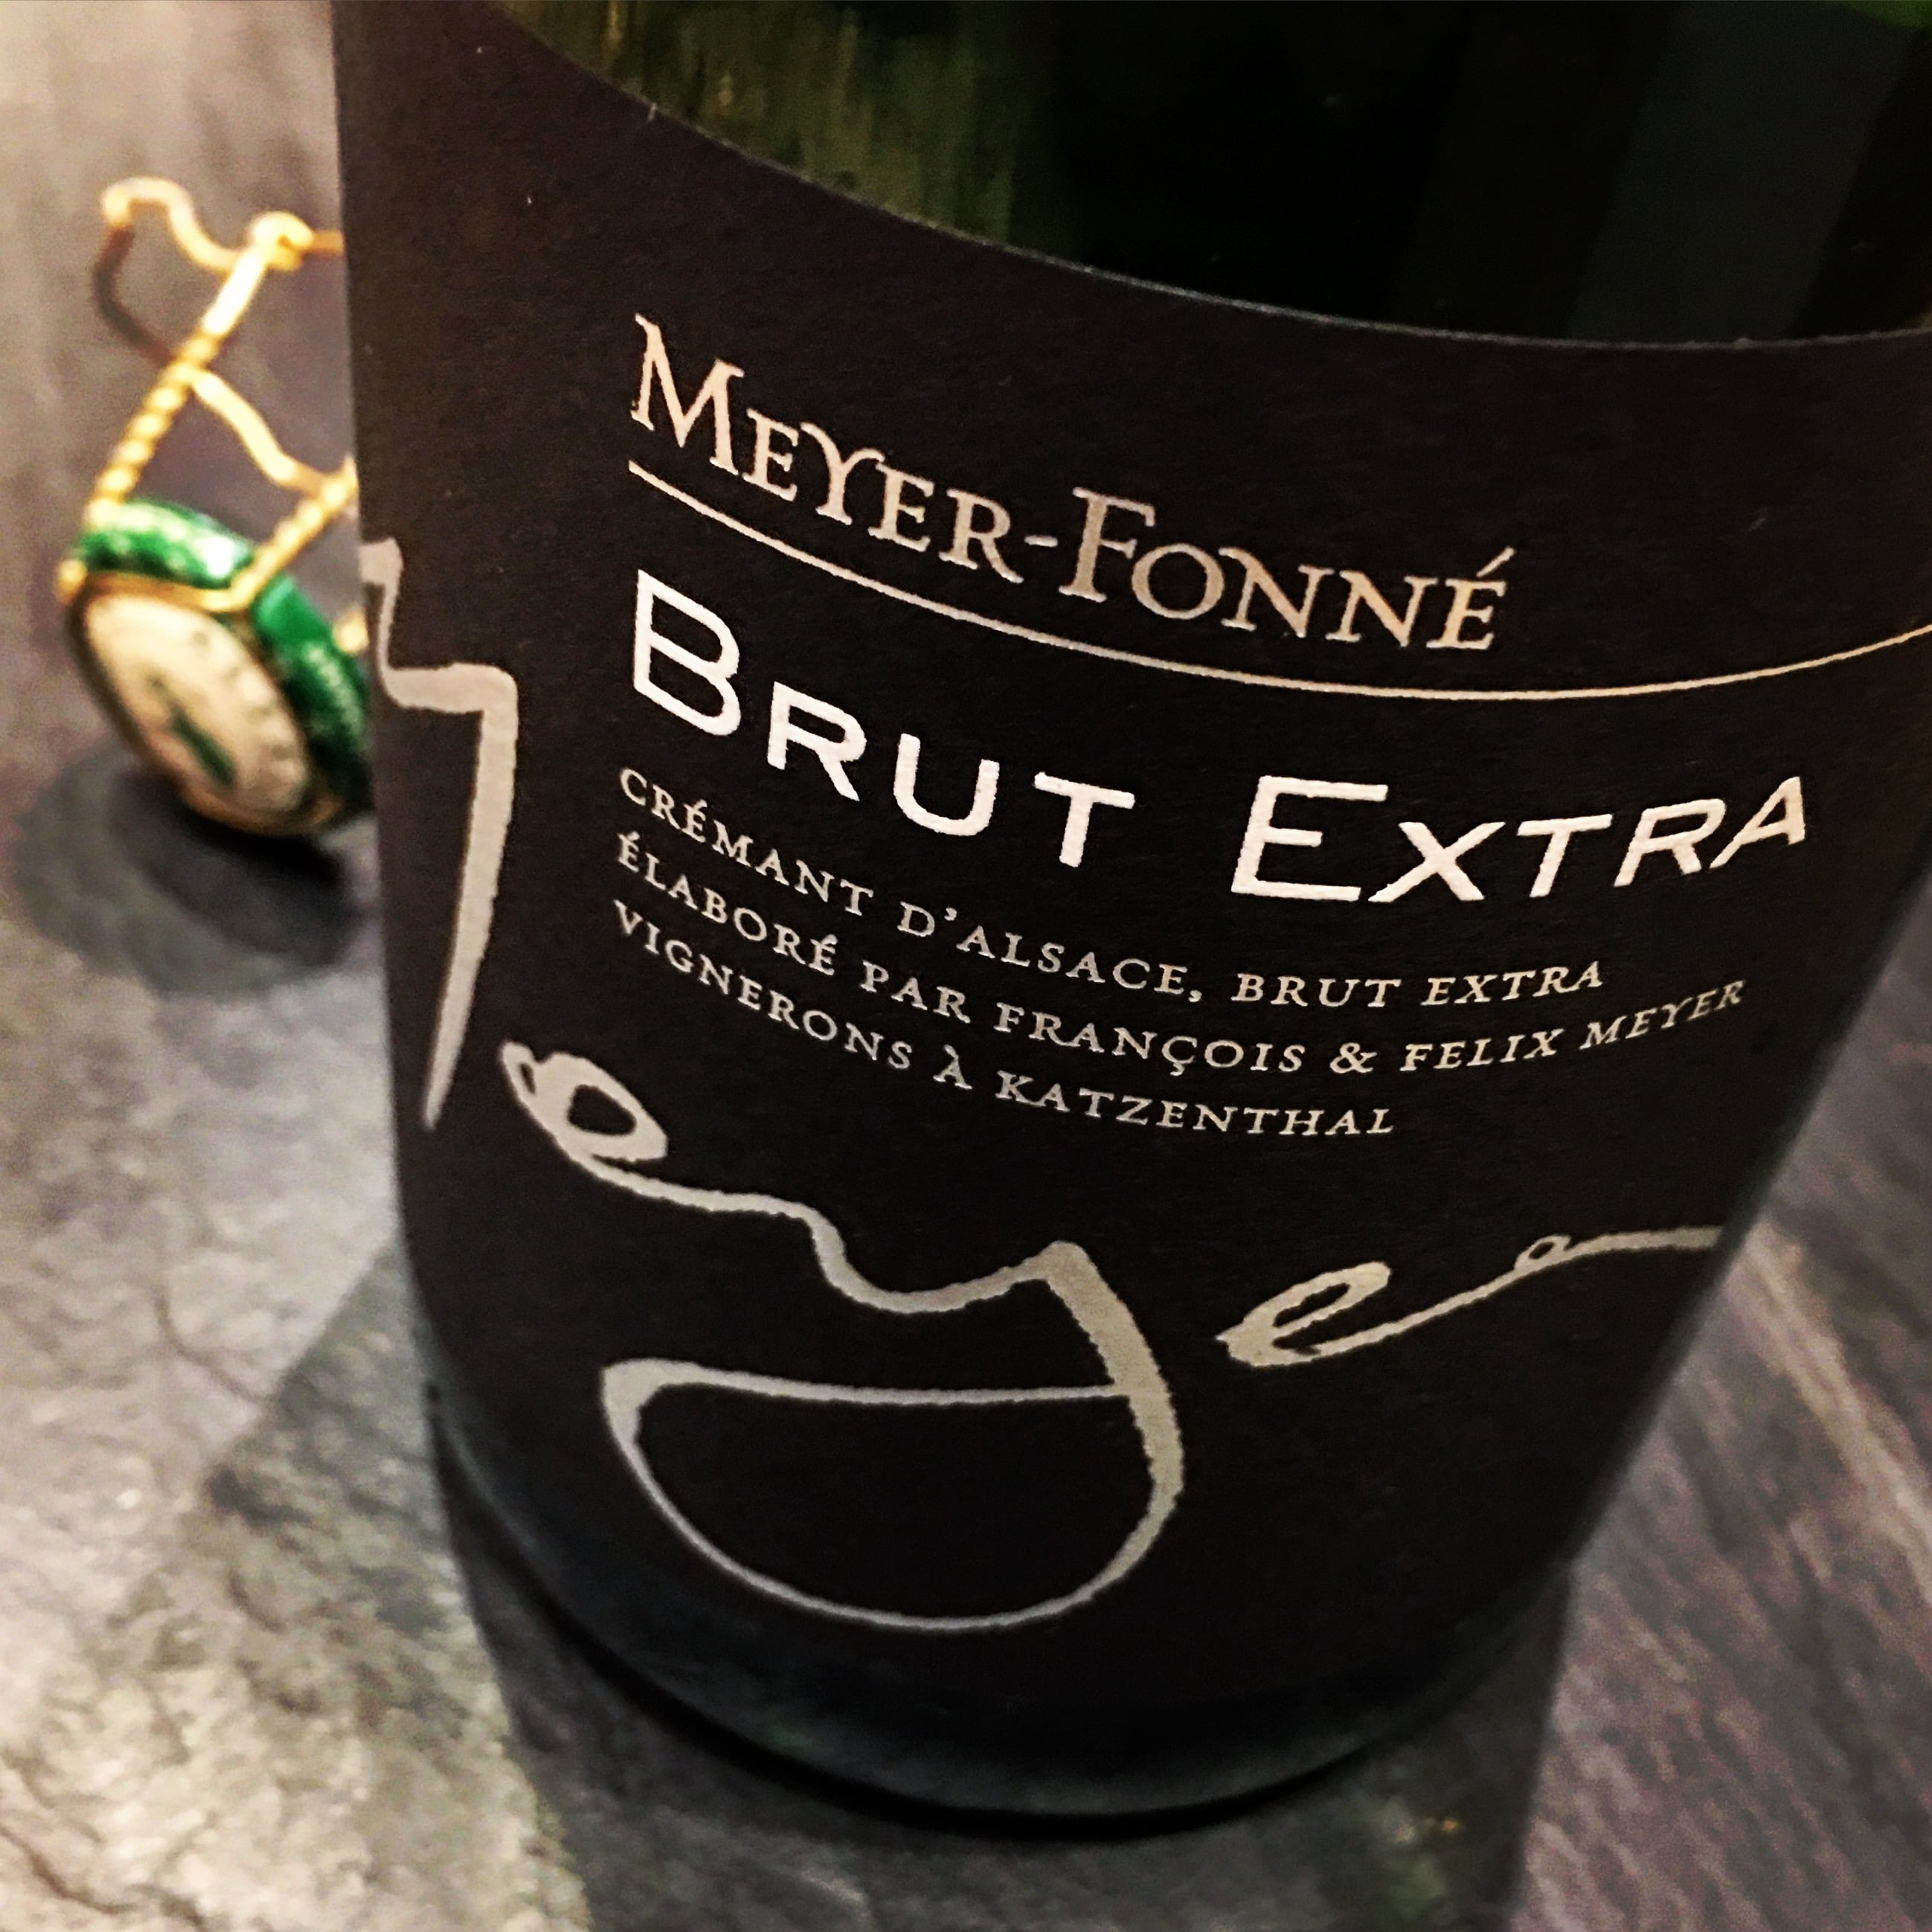 Meyer-Fonné Crémant d'Alsace Brut Extra NV